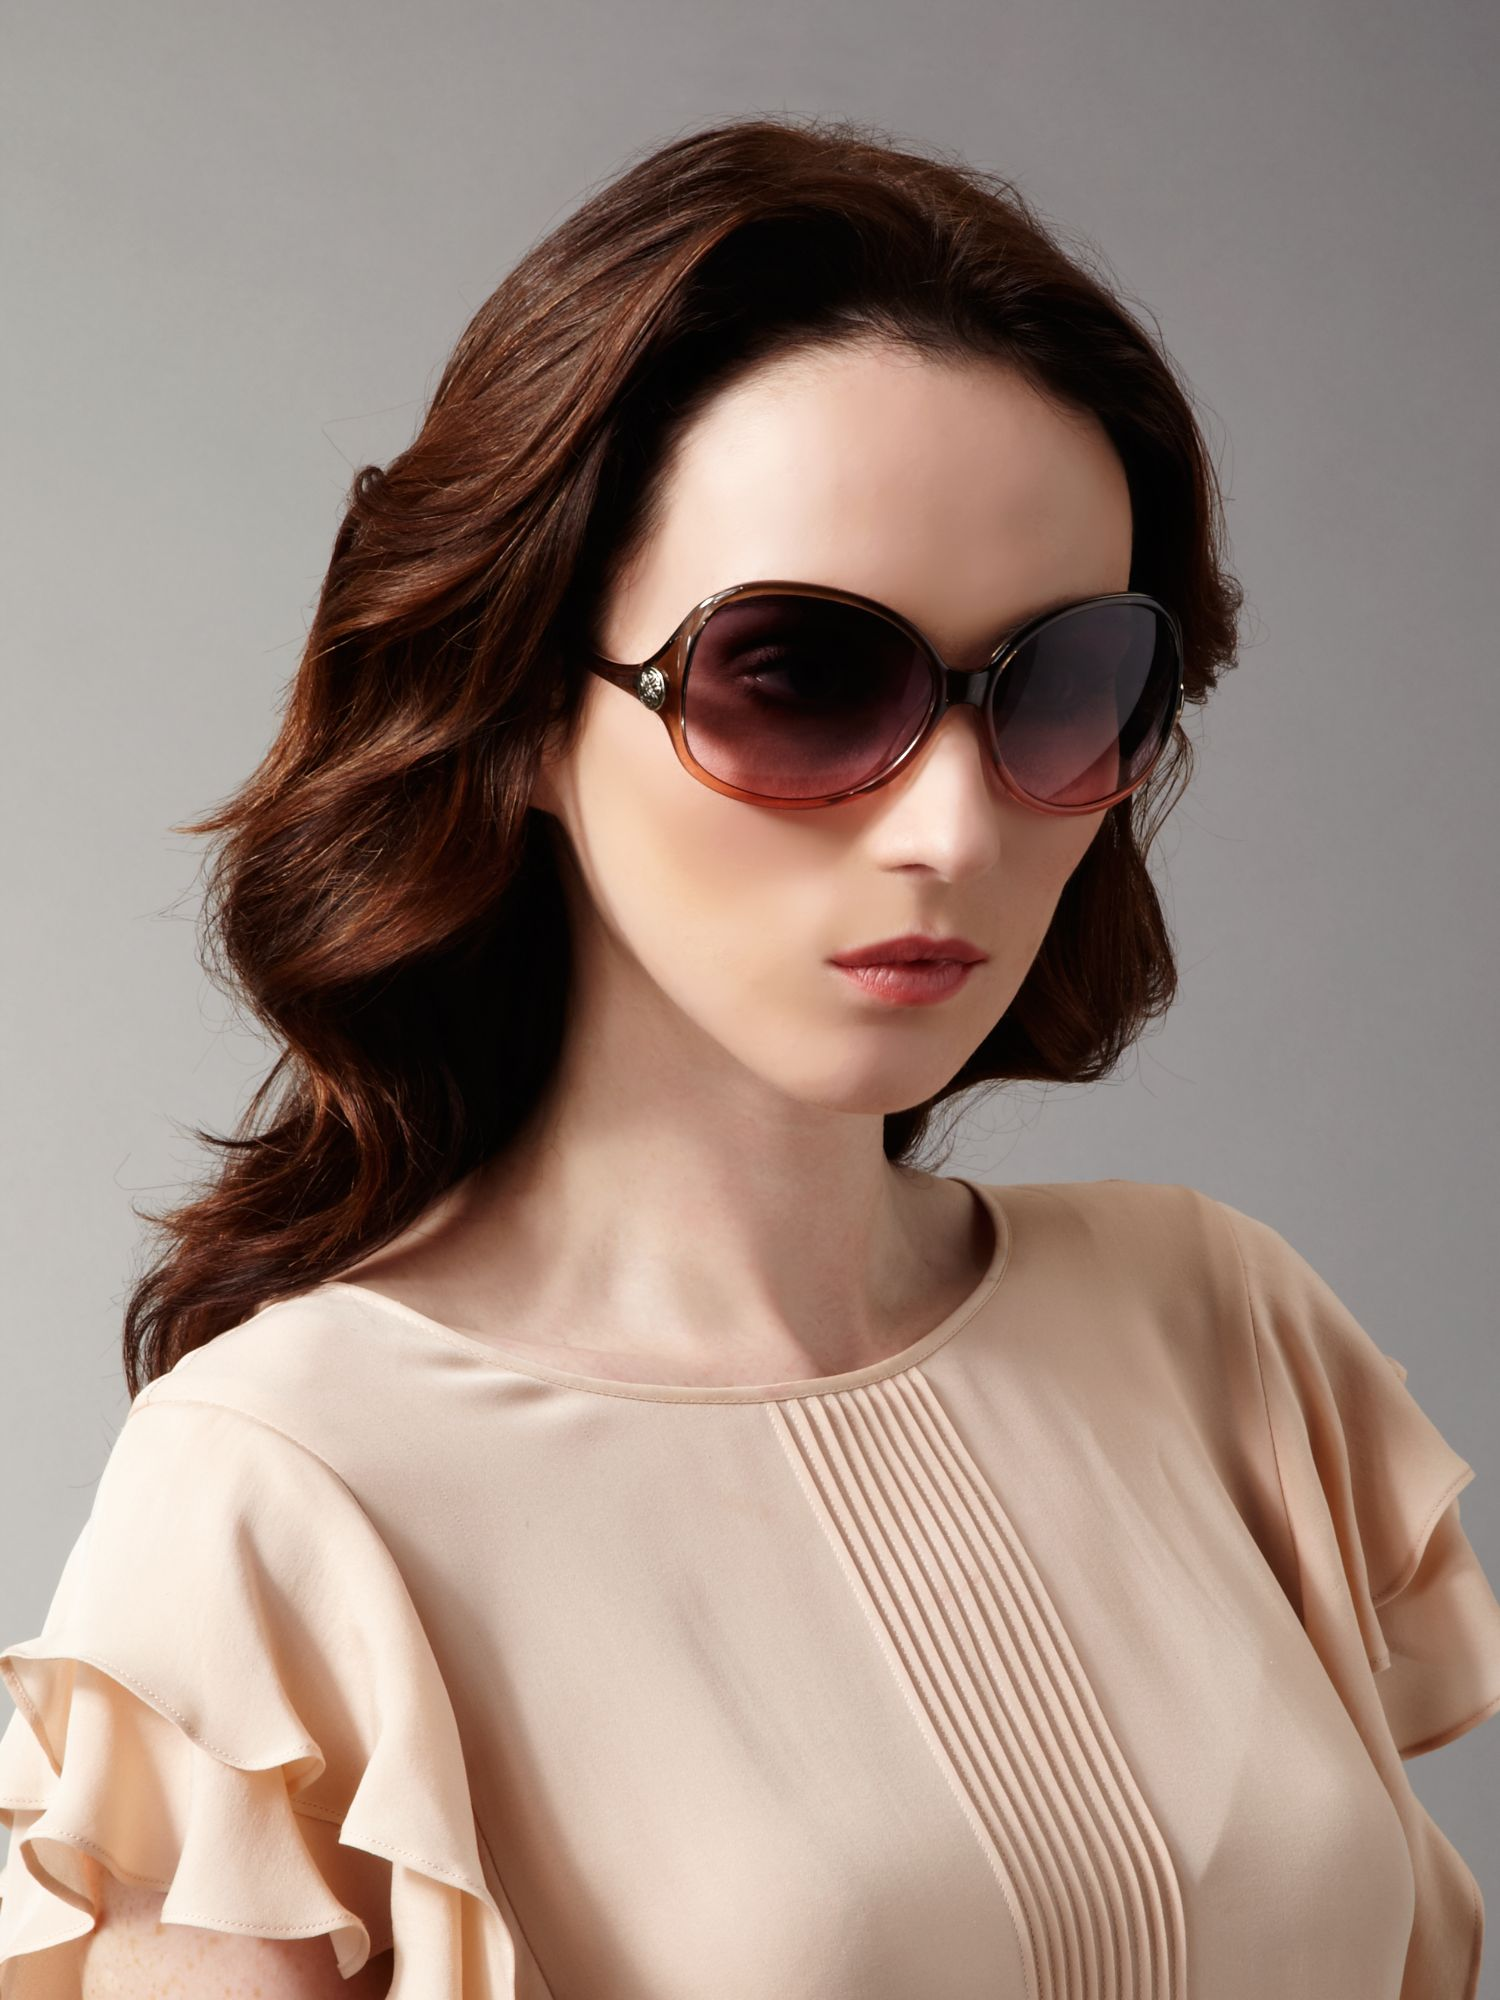 Biba Bianca Undulating Arm Sunglasses in Brown